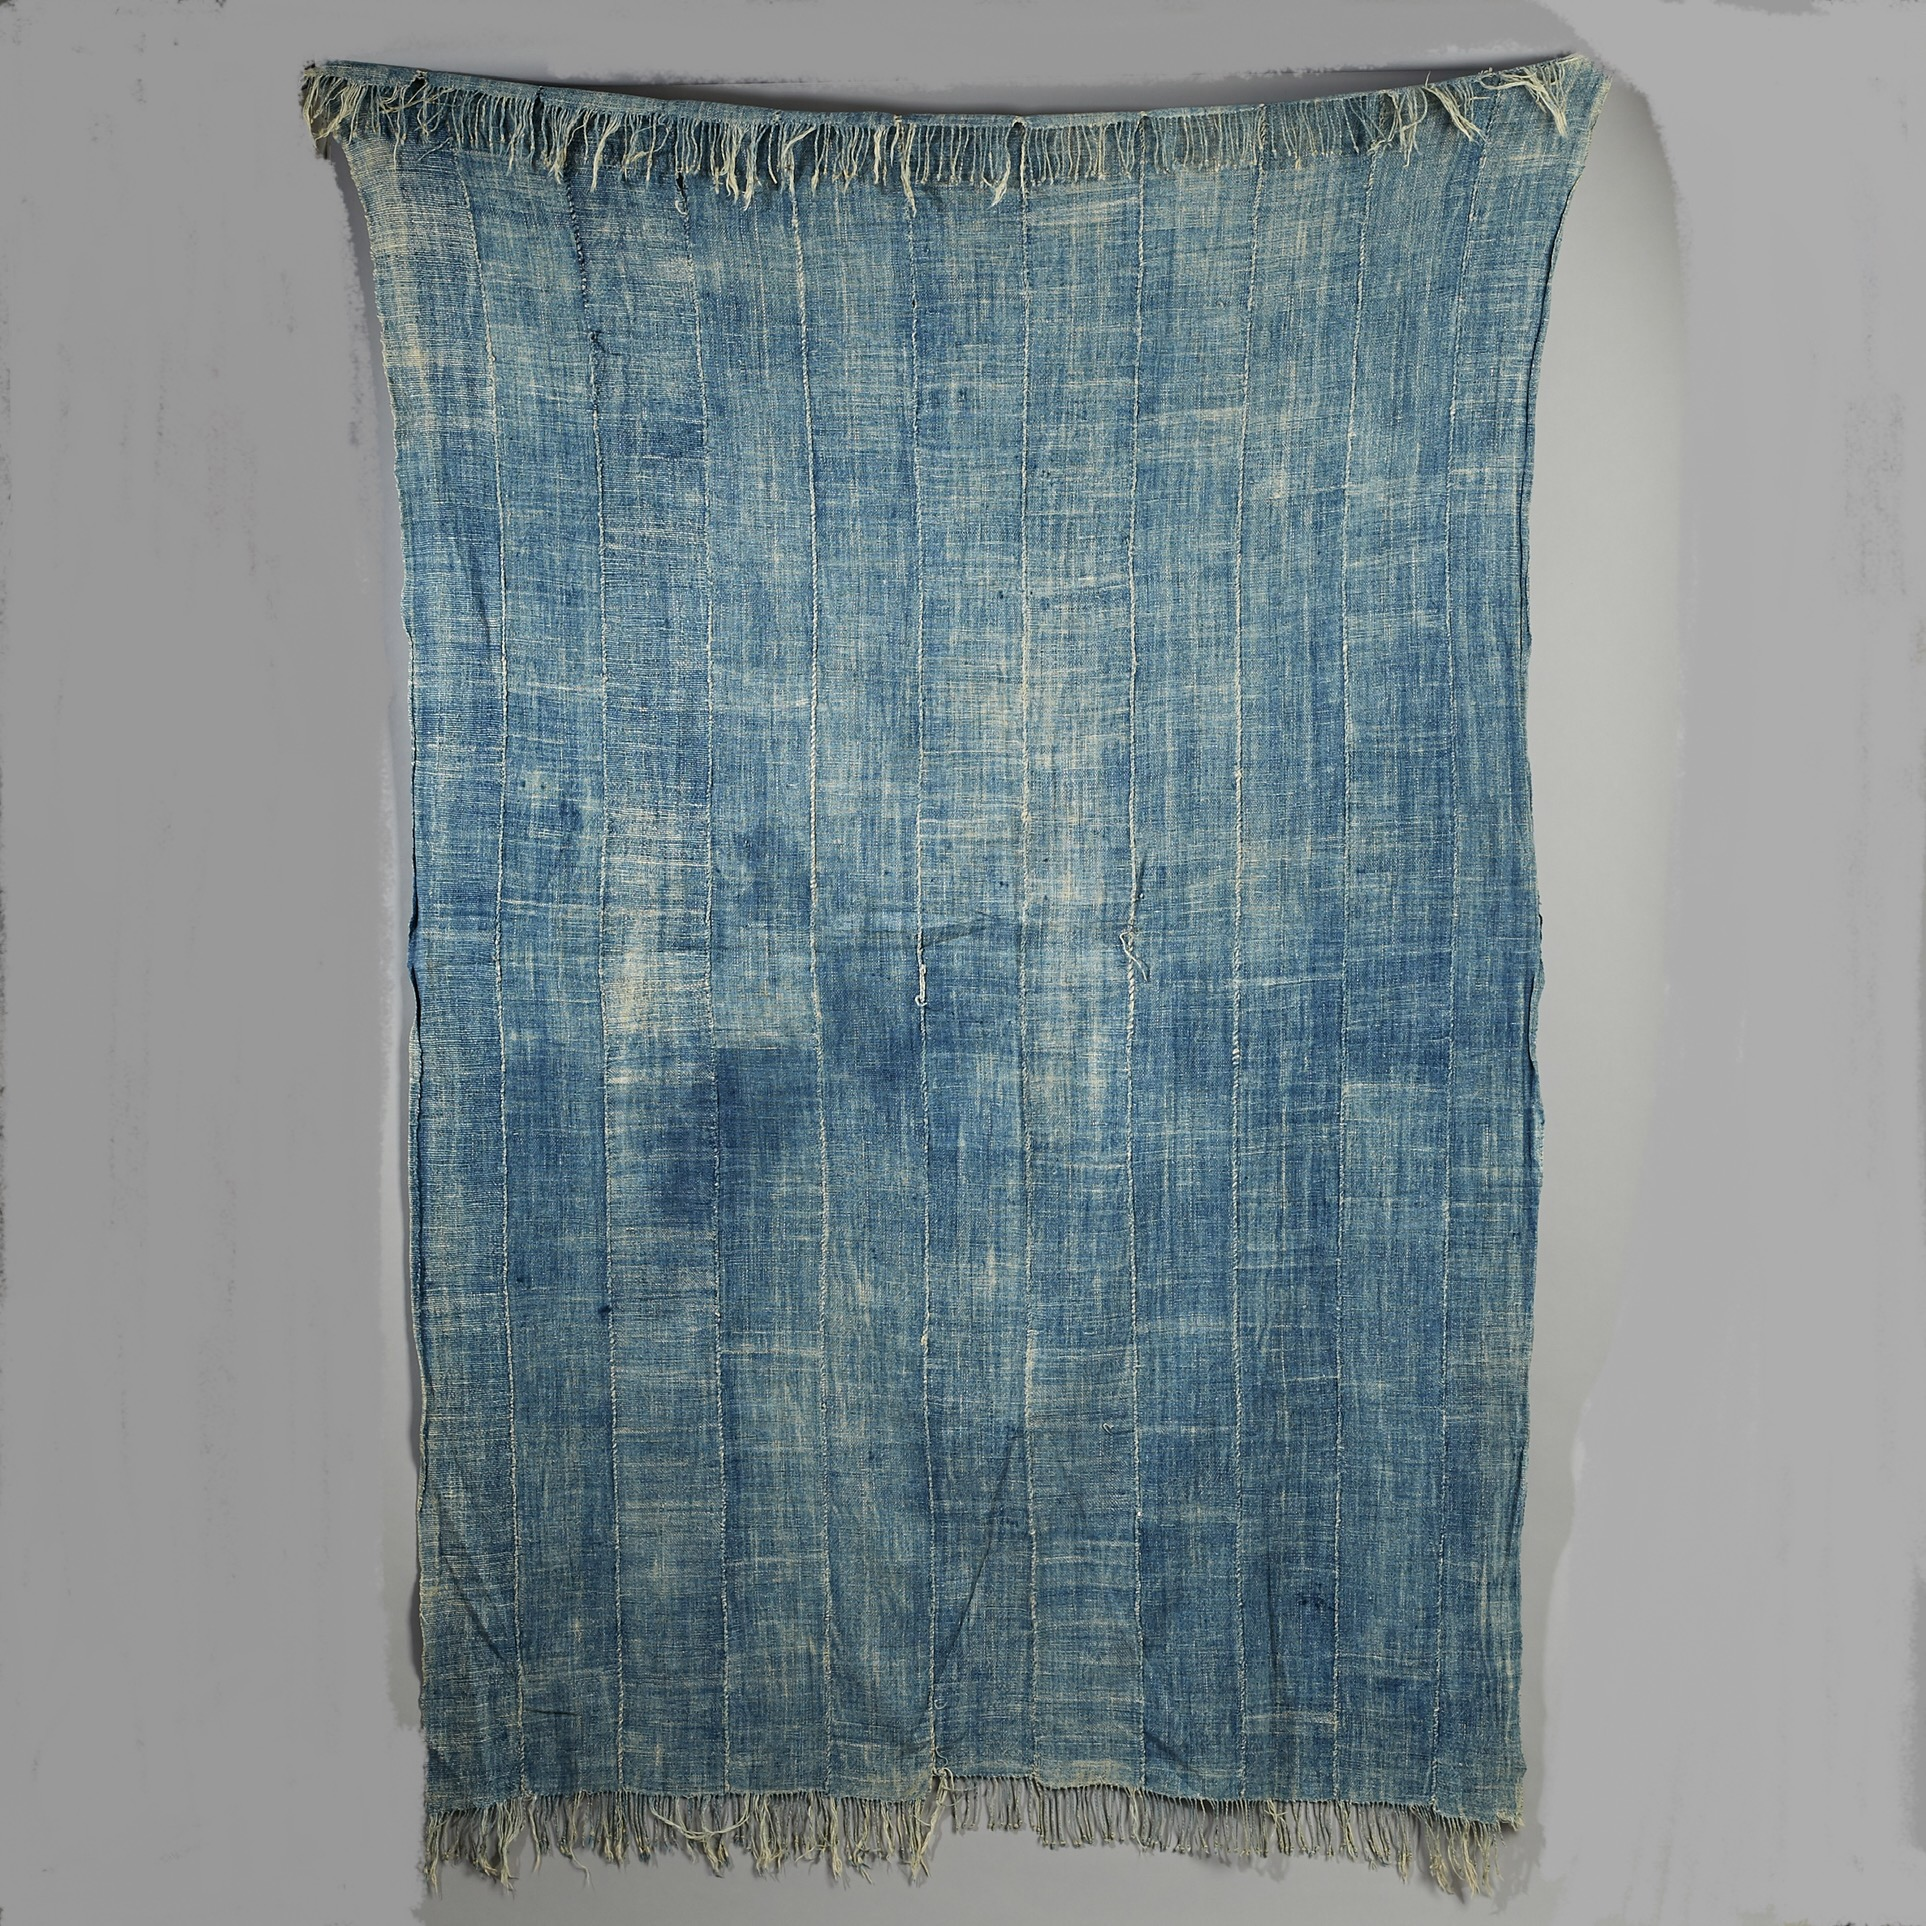 A WORN DENIMY INDIGO CLOTH FROM BURKINA FASO ( No 2967 )